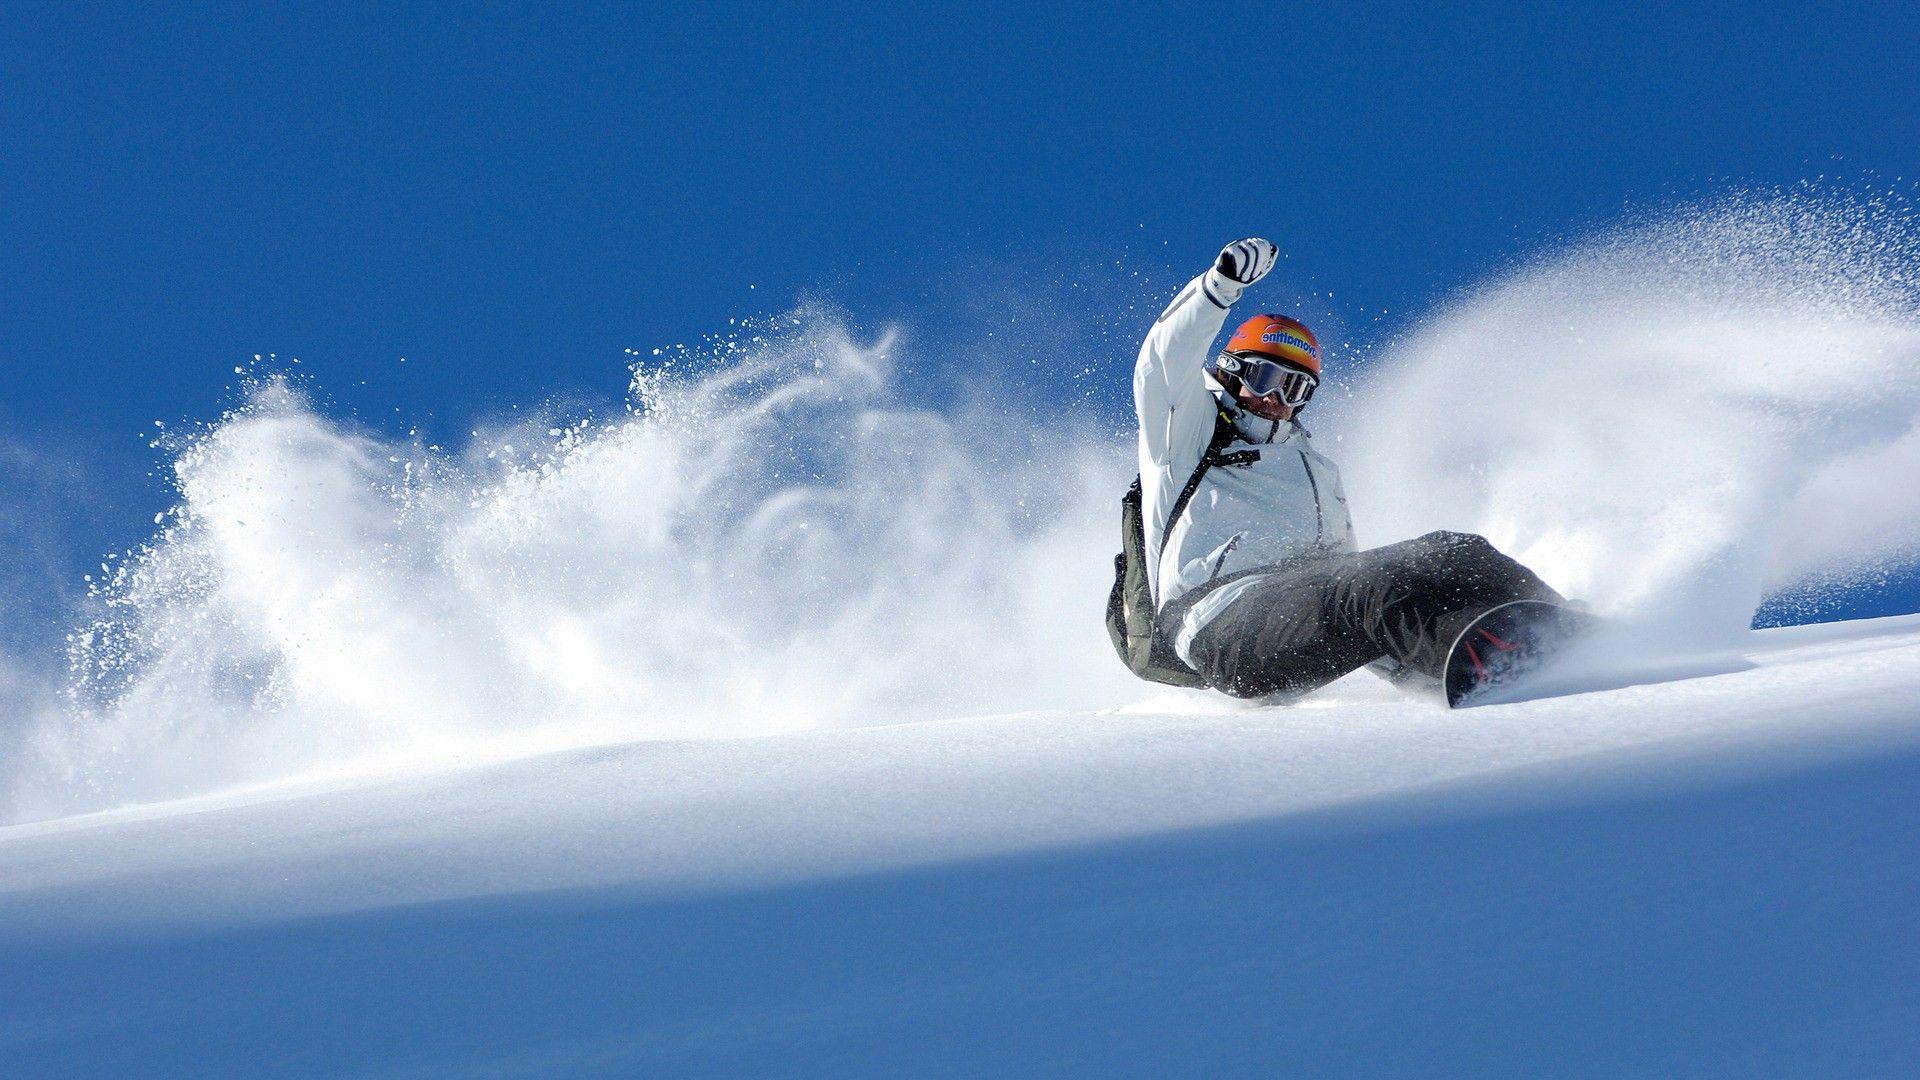 Snowboarding Wallpapers Hd Wallpaper Cave